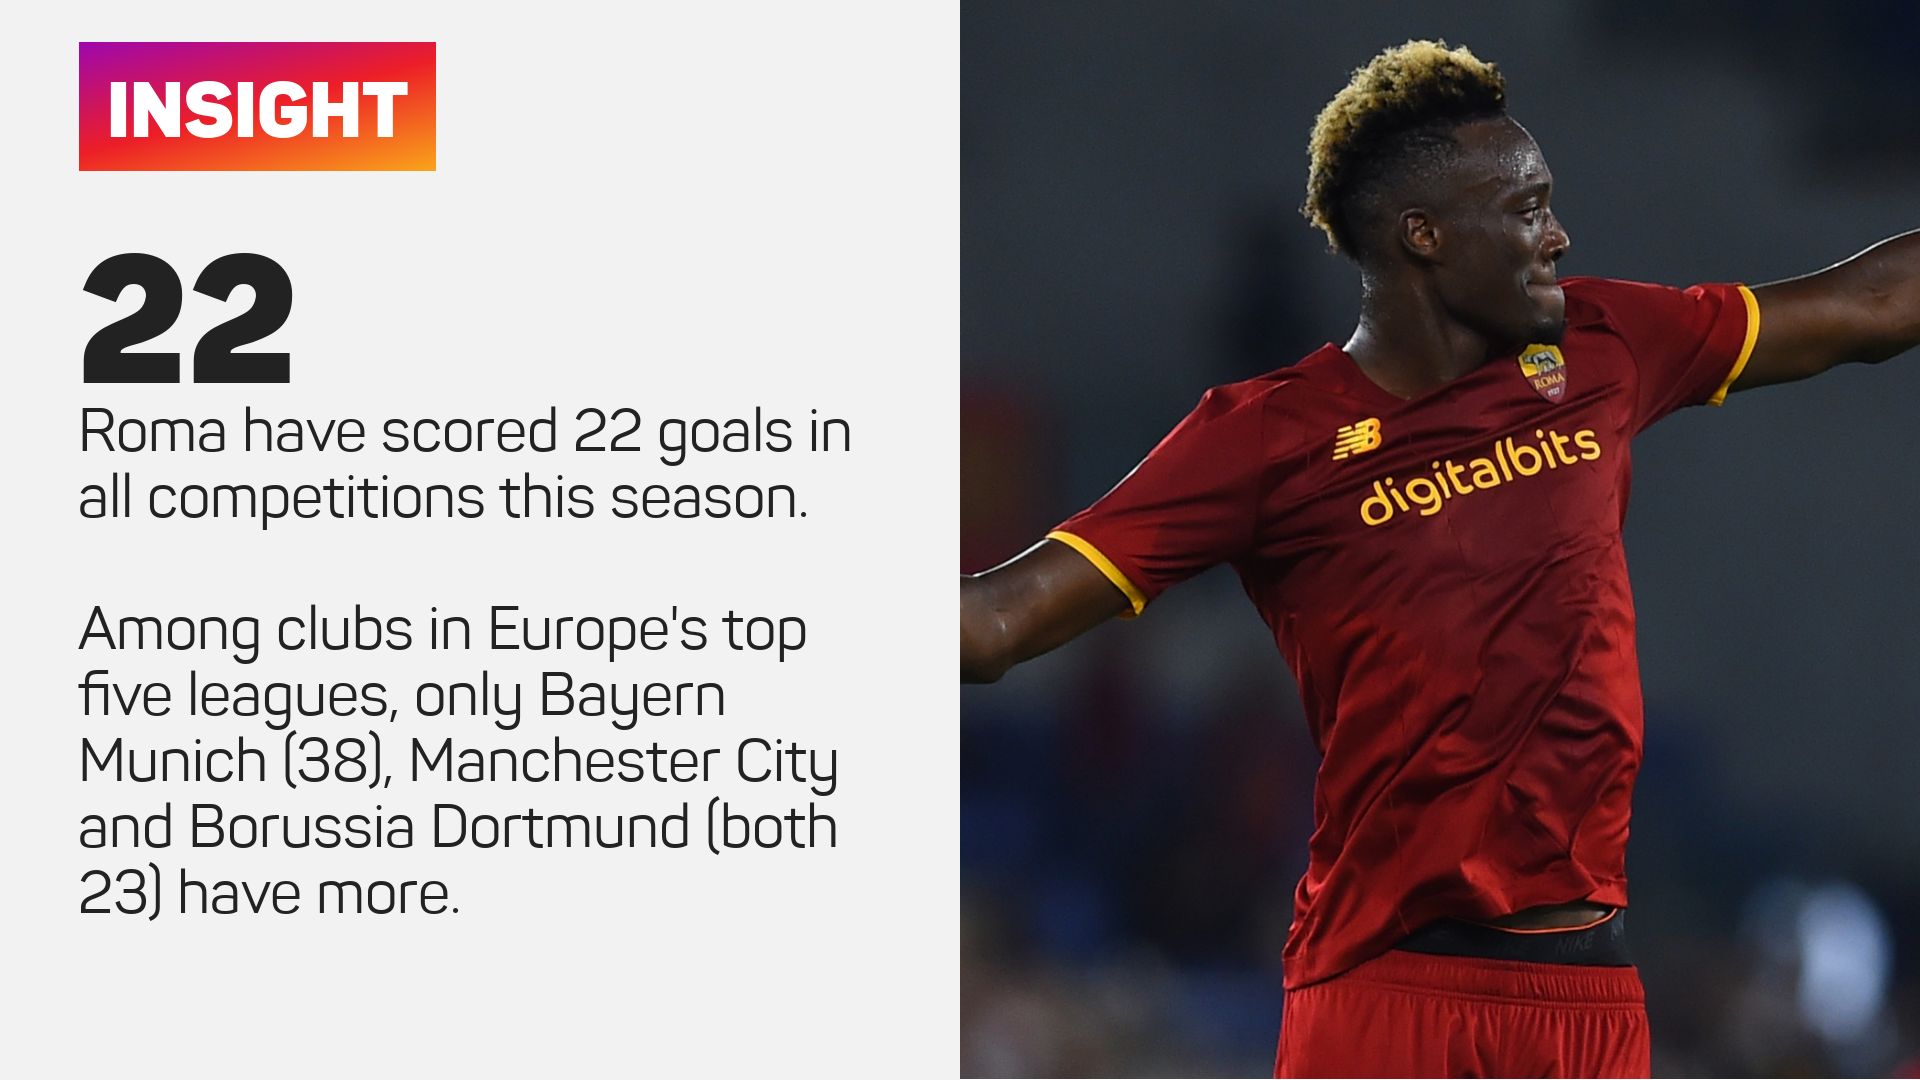 Roma have scored 22 goals this season